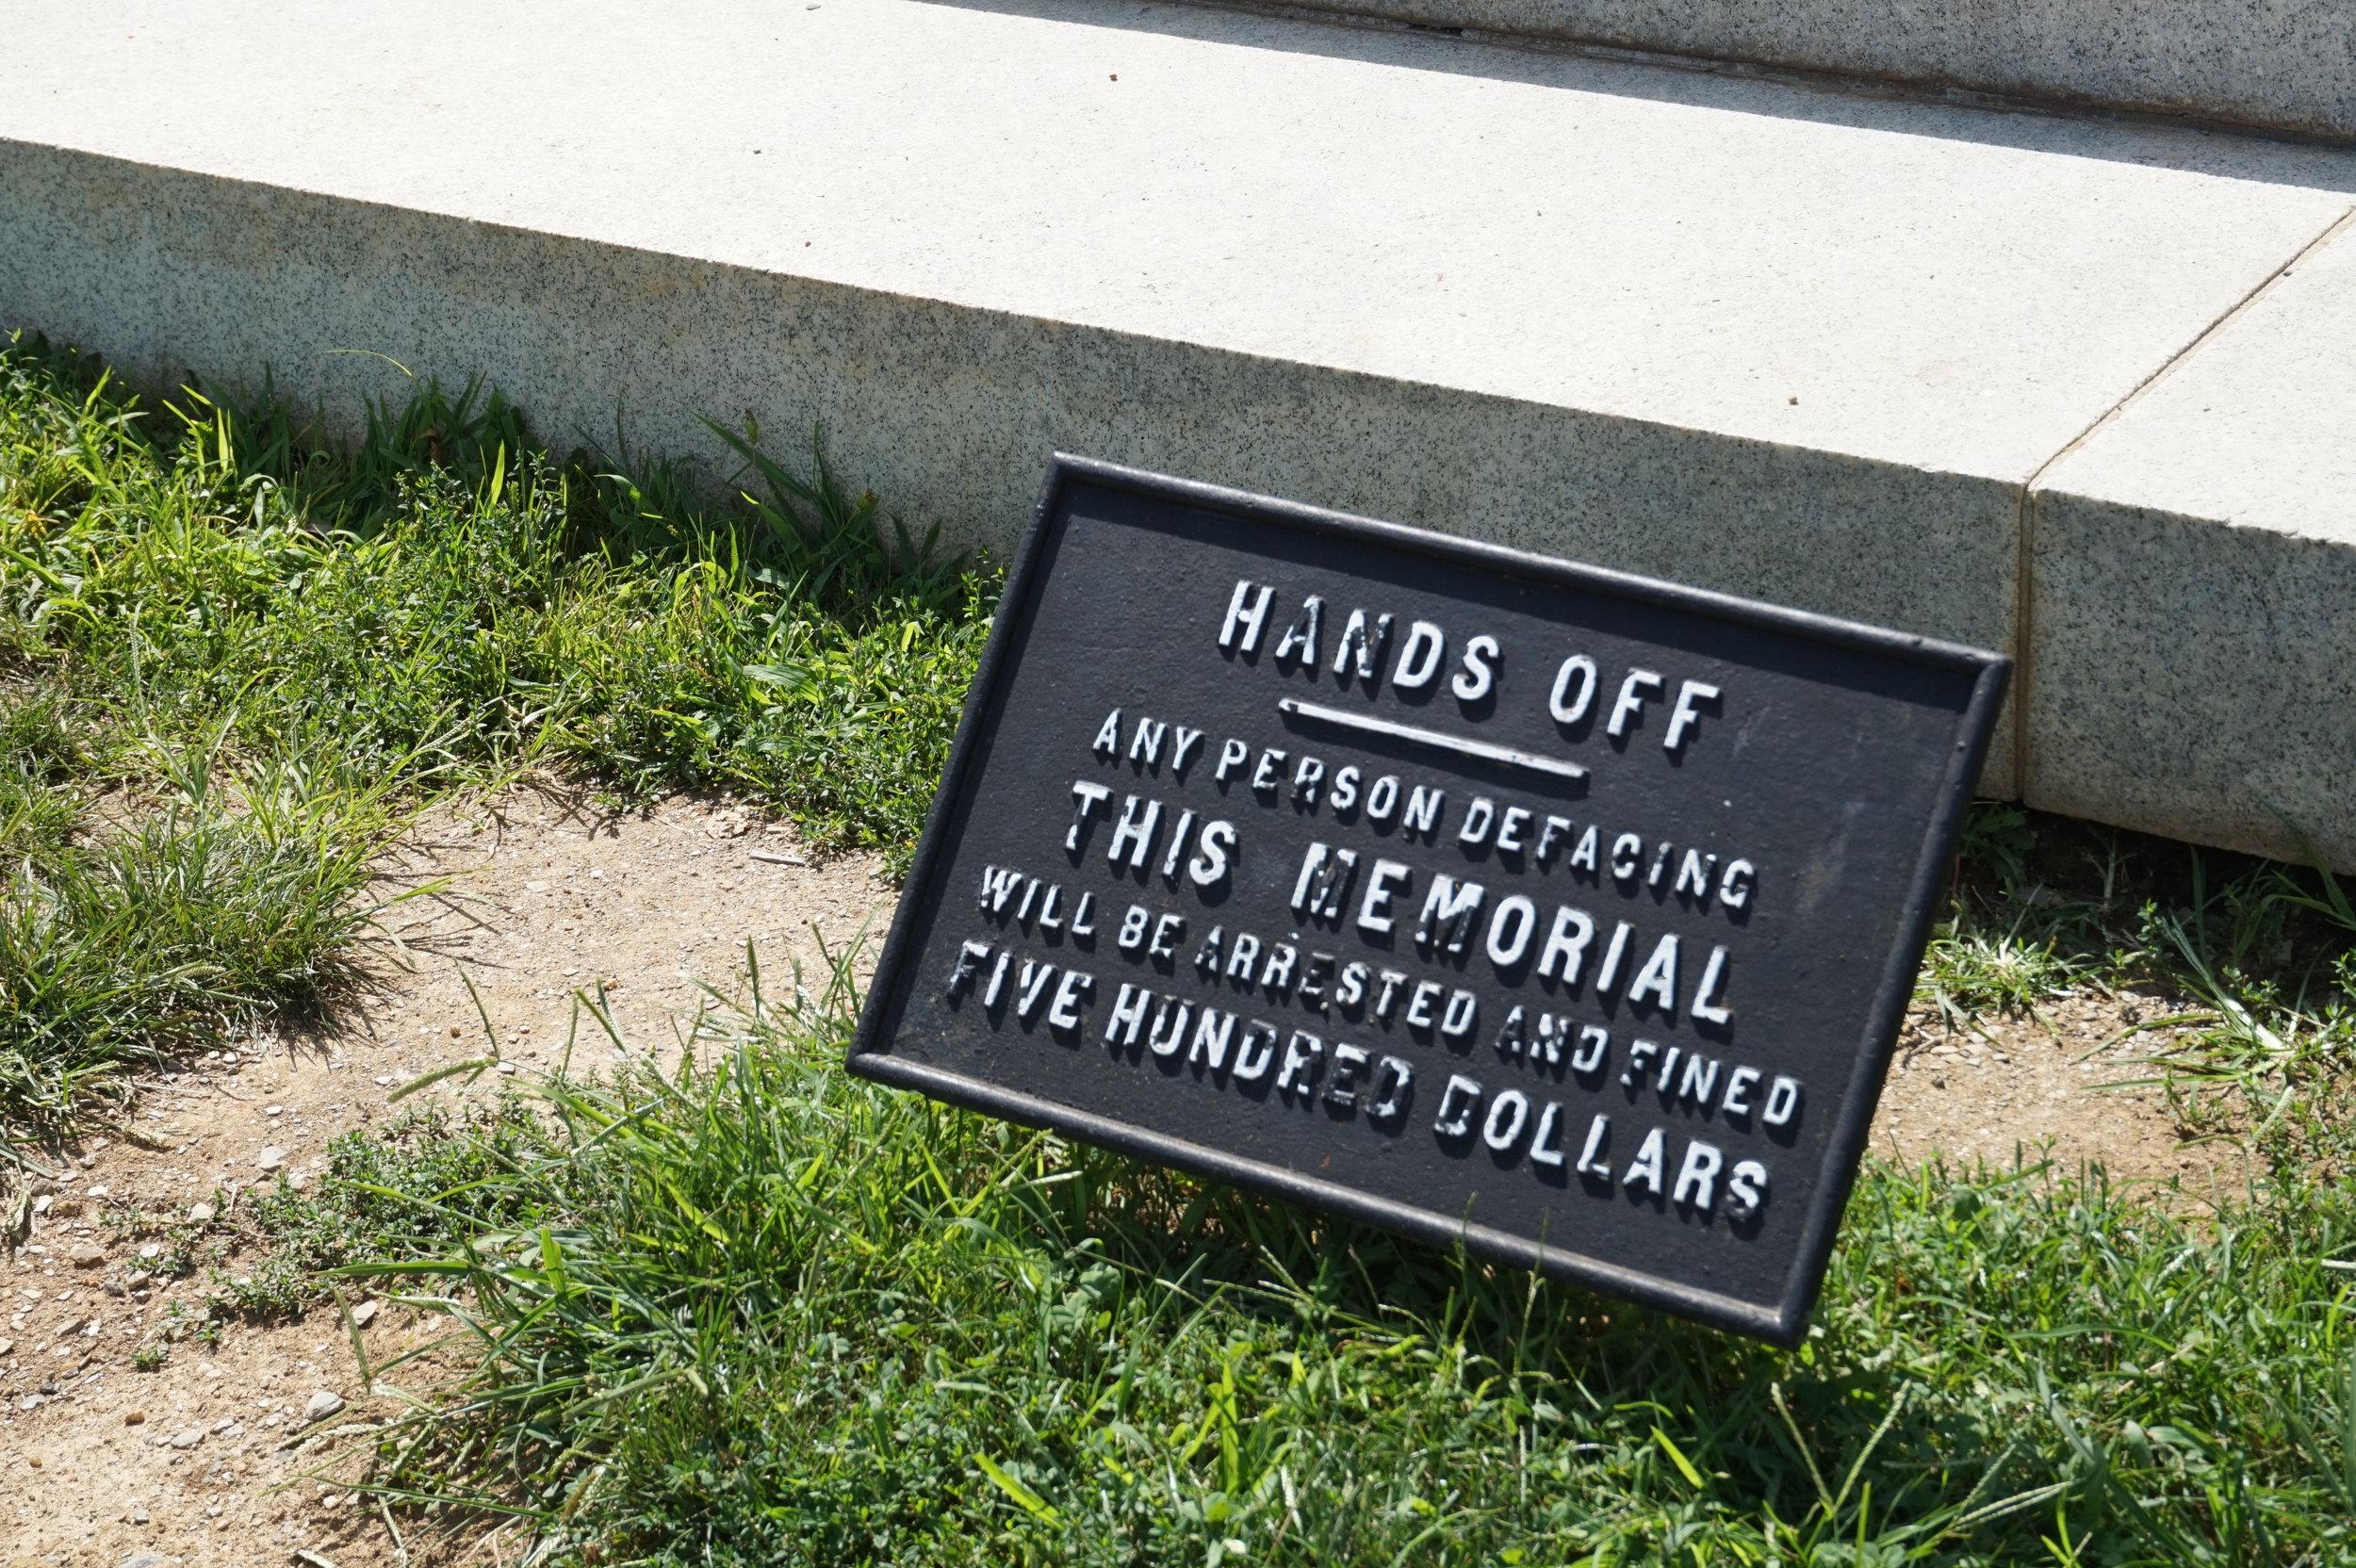 A word of warning below the Robert E. Lee statue.